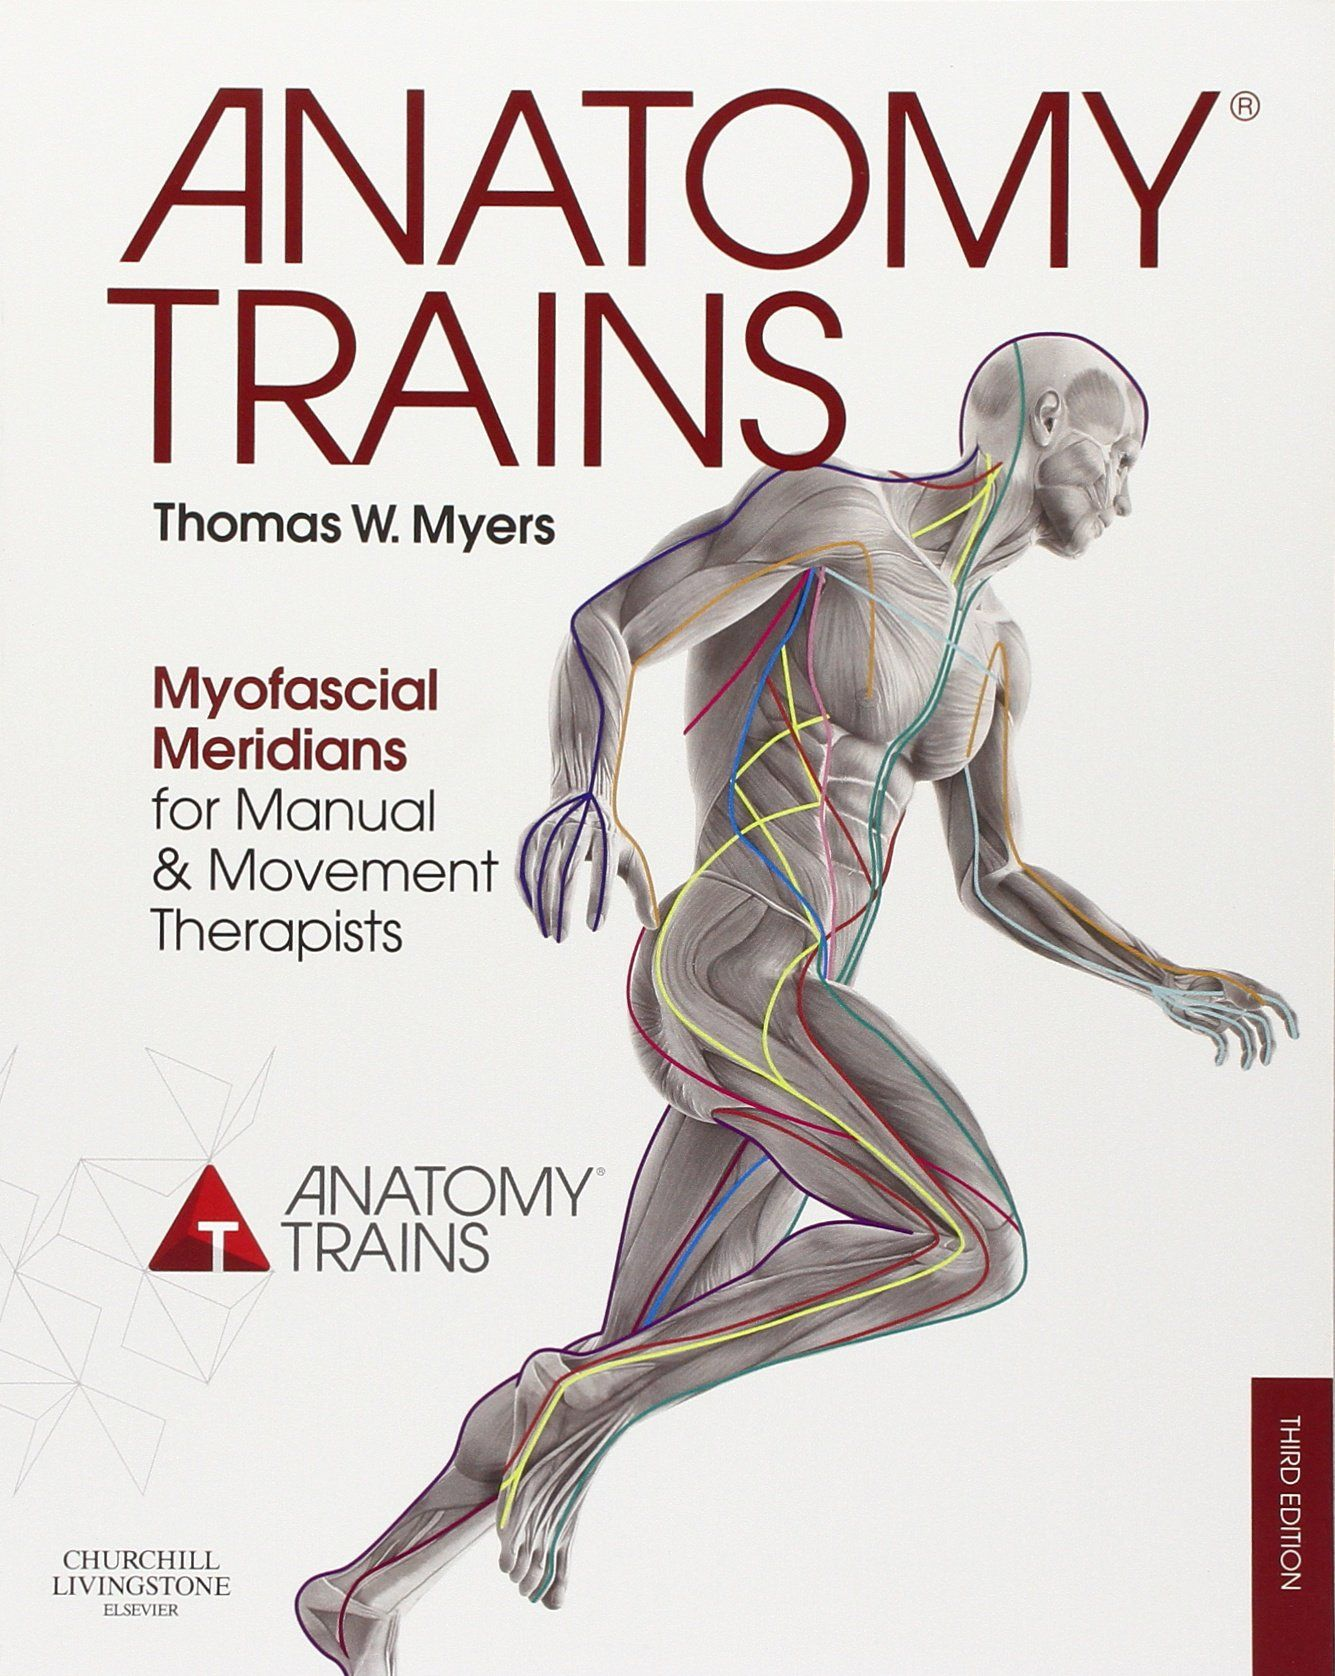 anatomy trains myofascial meridians for manual and movement anatomy trains myofascial meridians for manual and movement therapists by thomas w myers